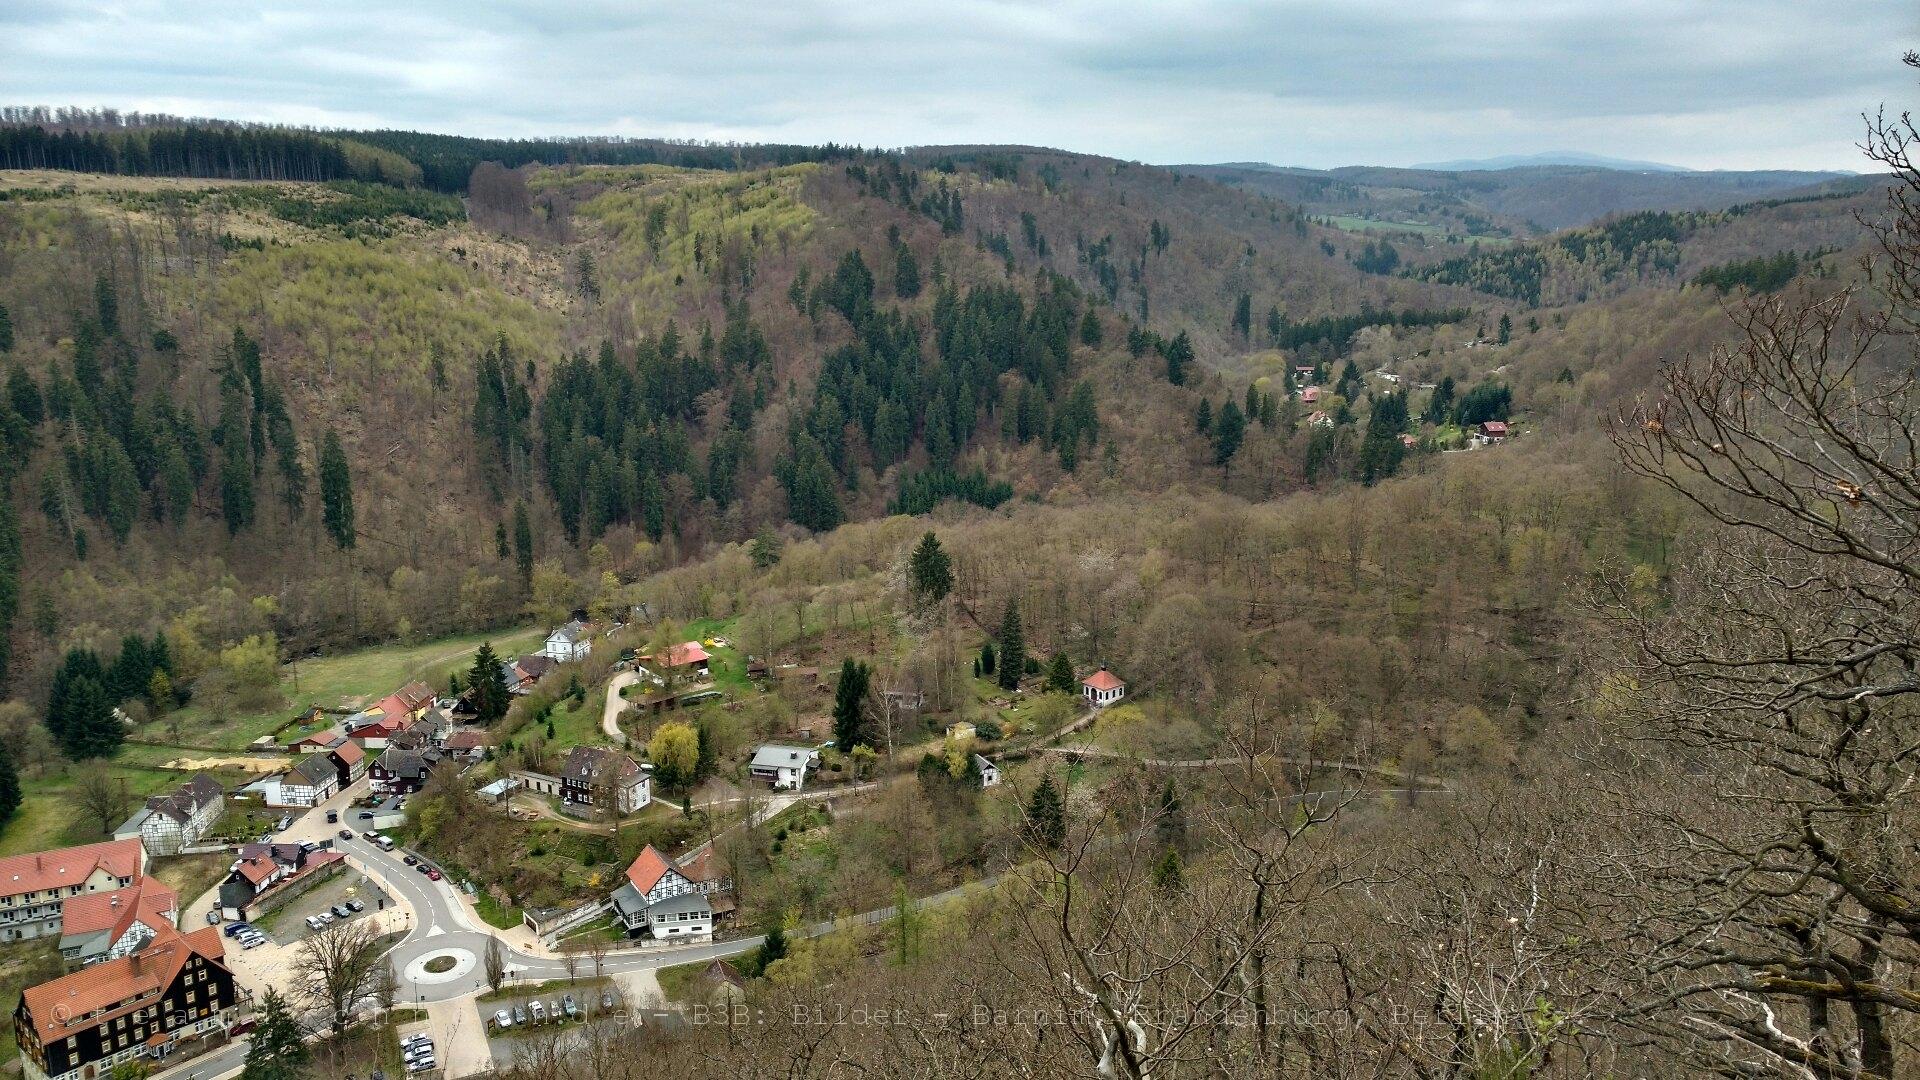 Brockenblick über Treseburg